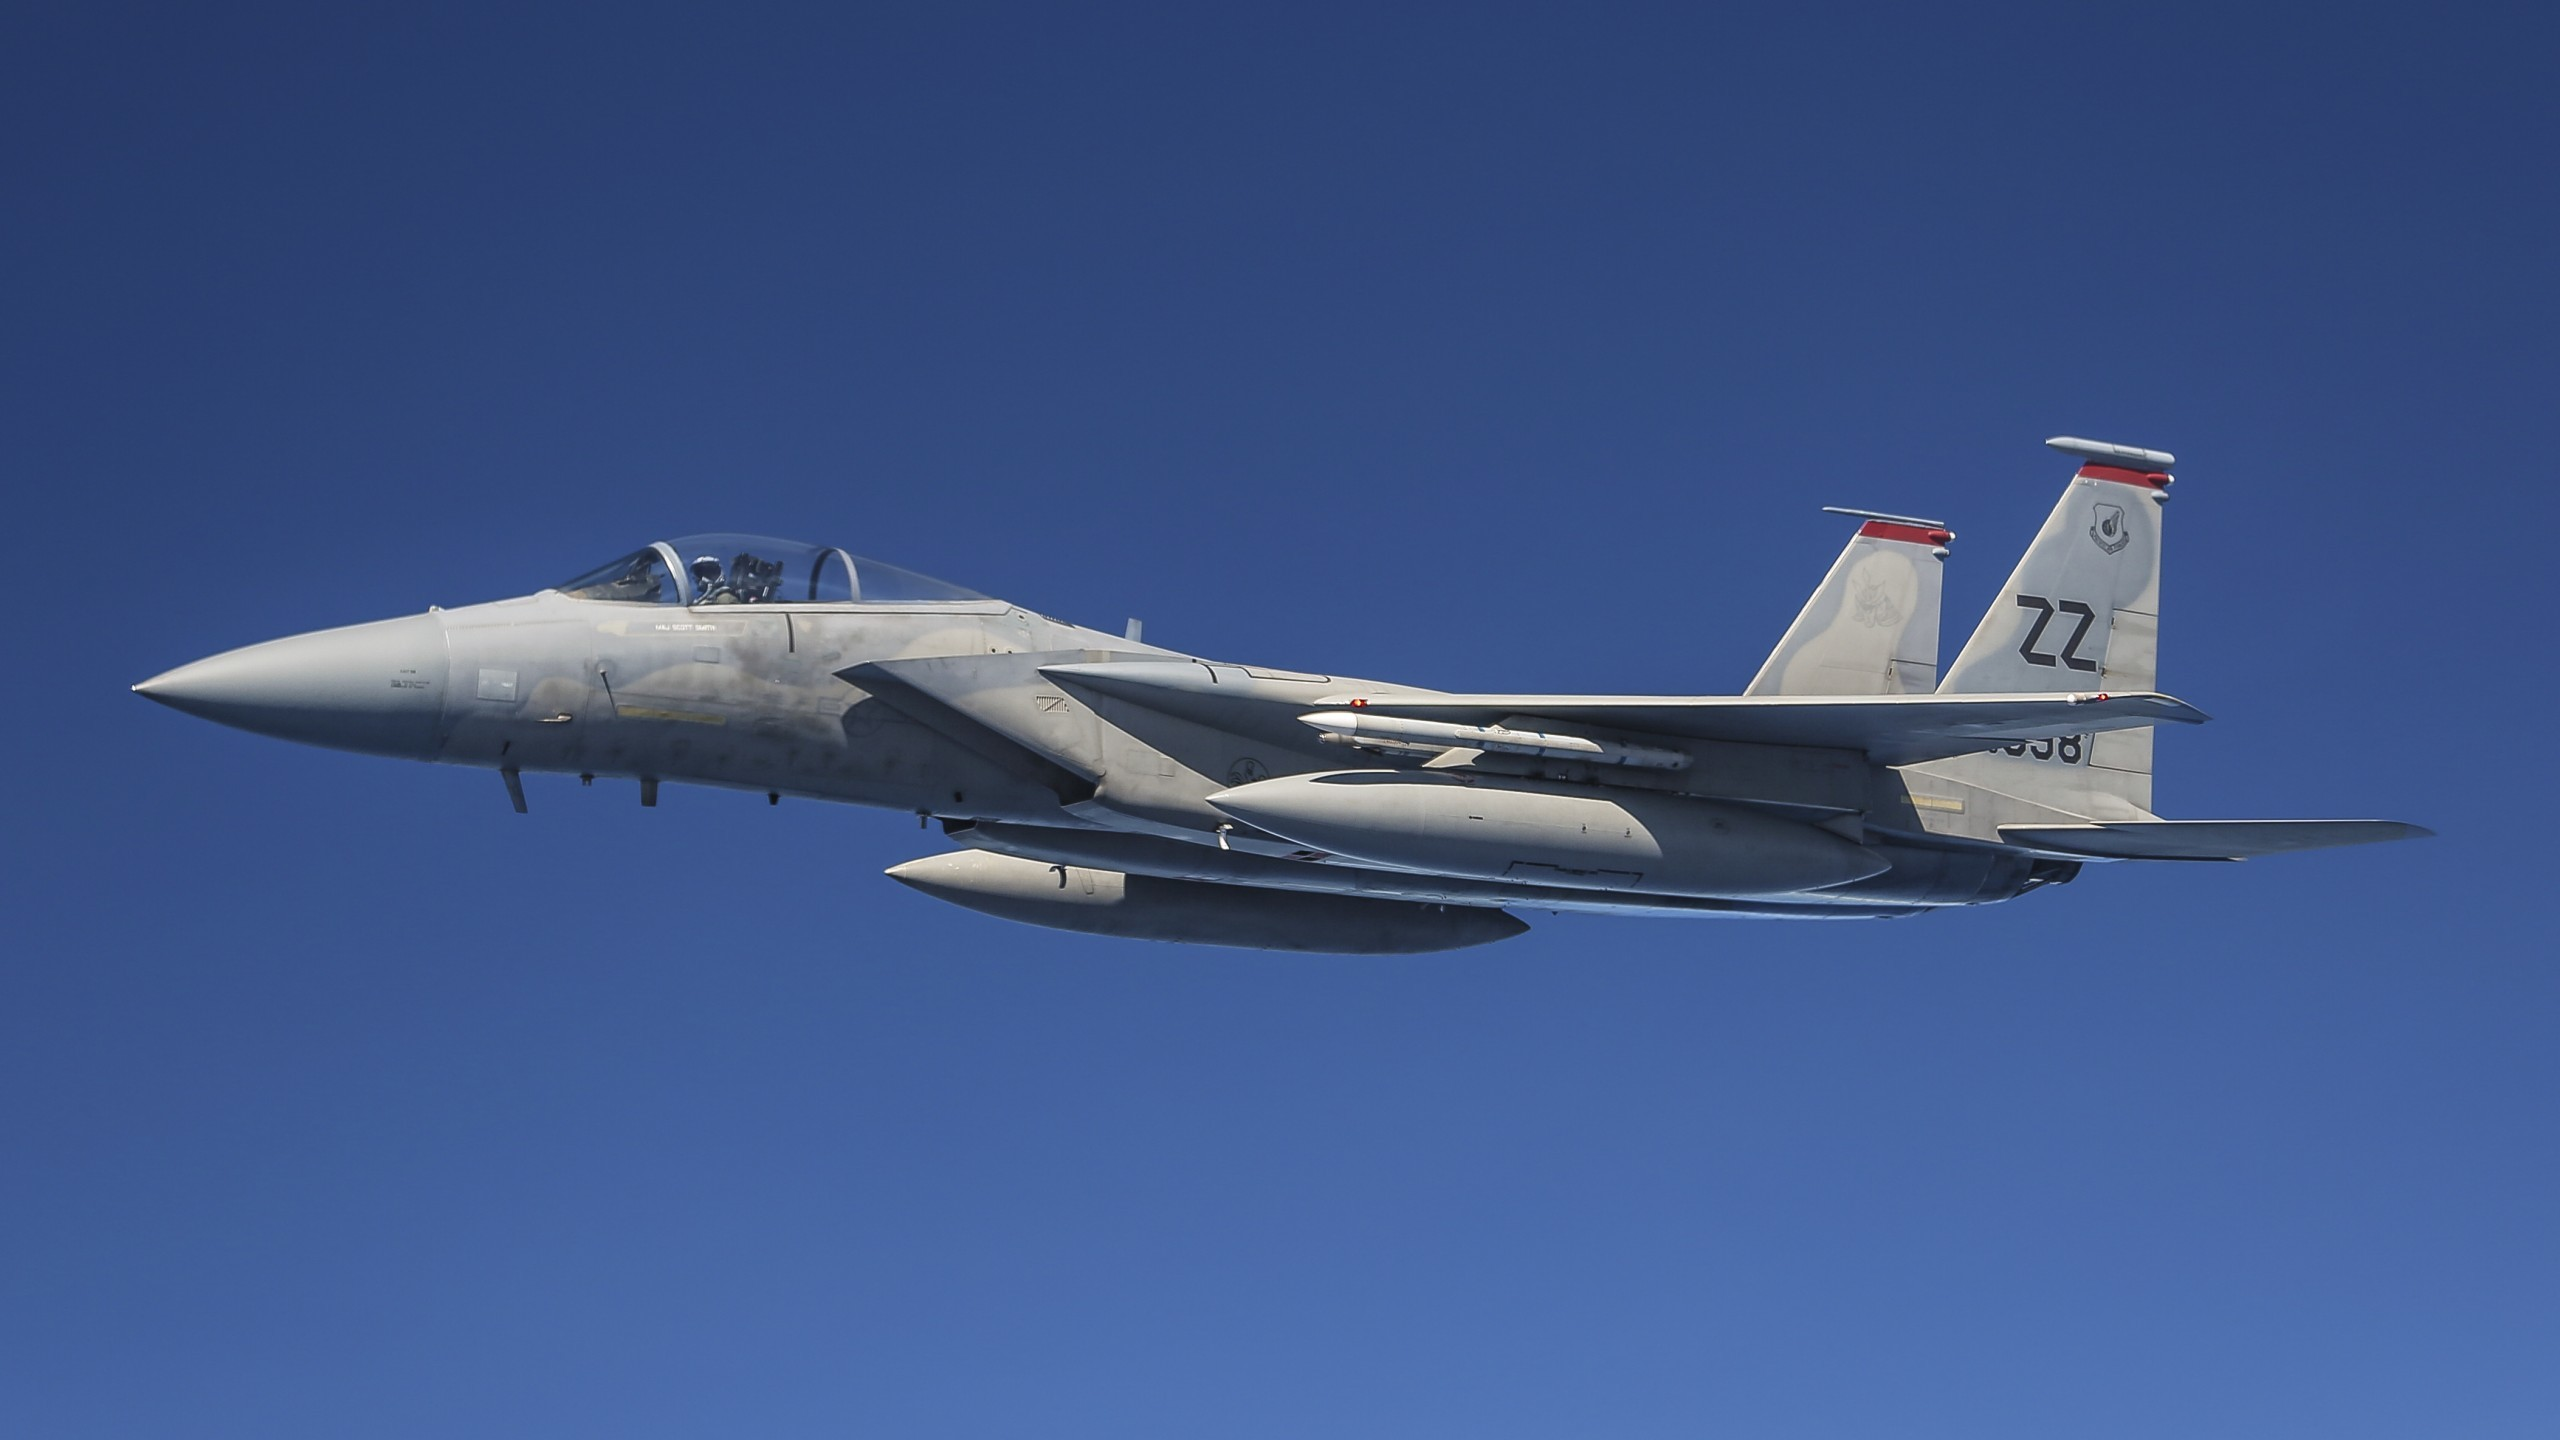 Military / McDonnell Douglas F/A-18 Hornet Wallpaper